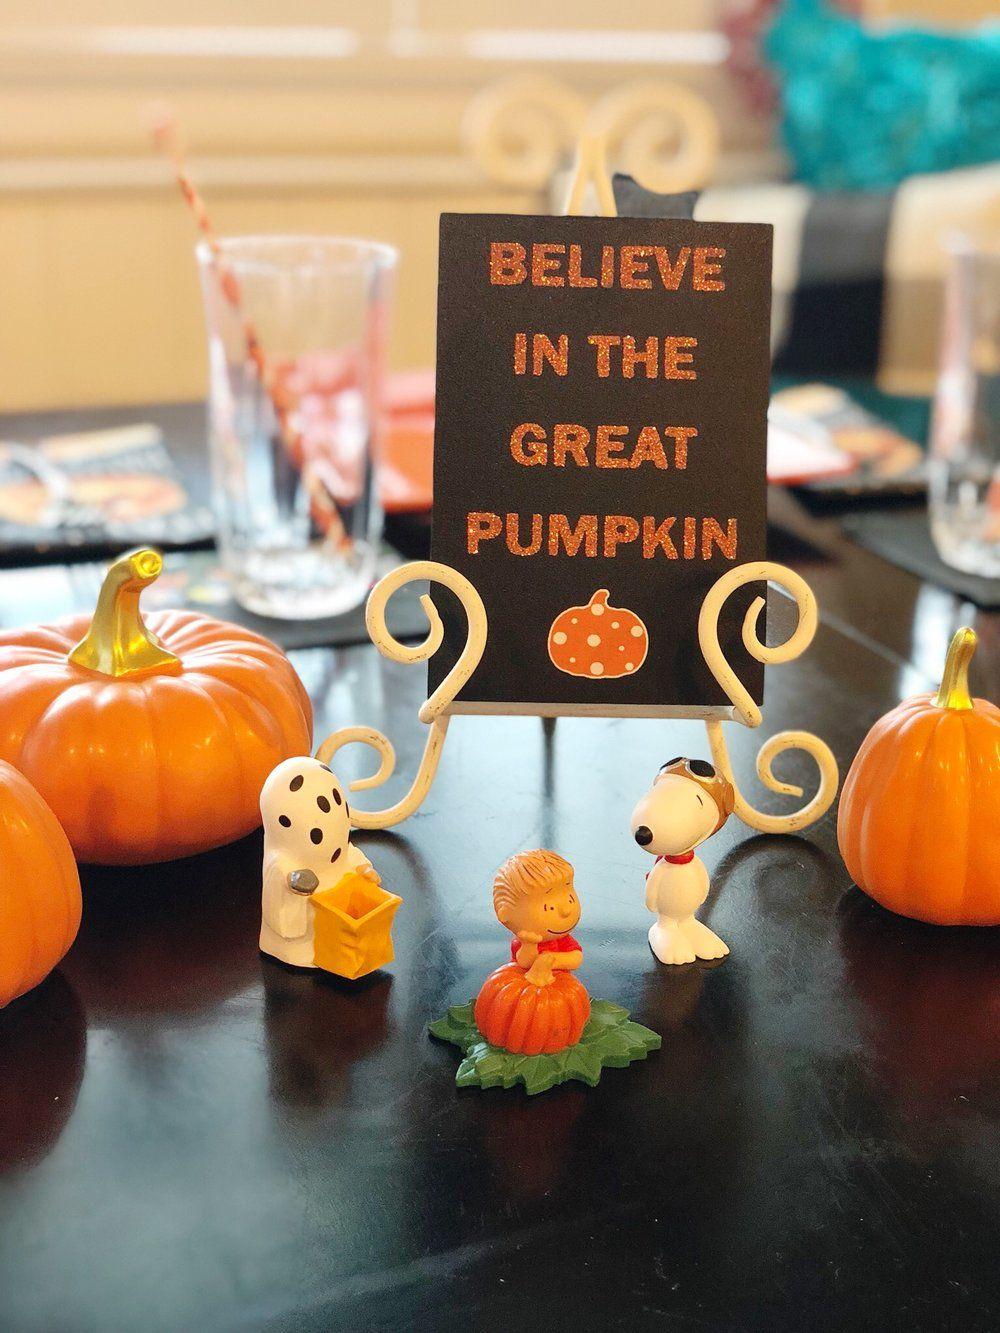 Movie Night It S The Great Pumpkin Charlie Brown Suburban Soiree Charlie Brown Halloween Movie Night Pumpkin Lights